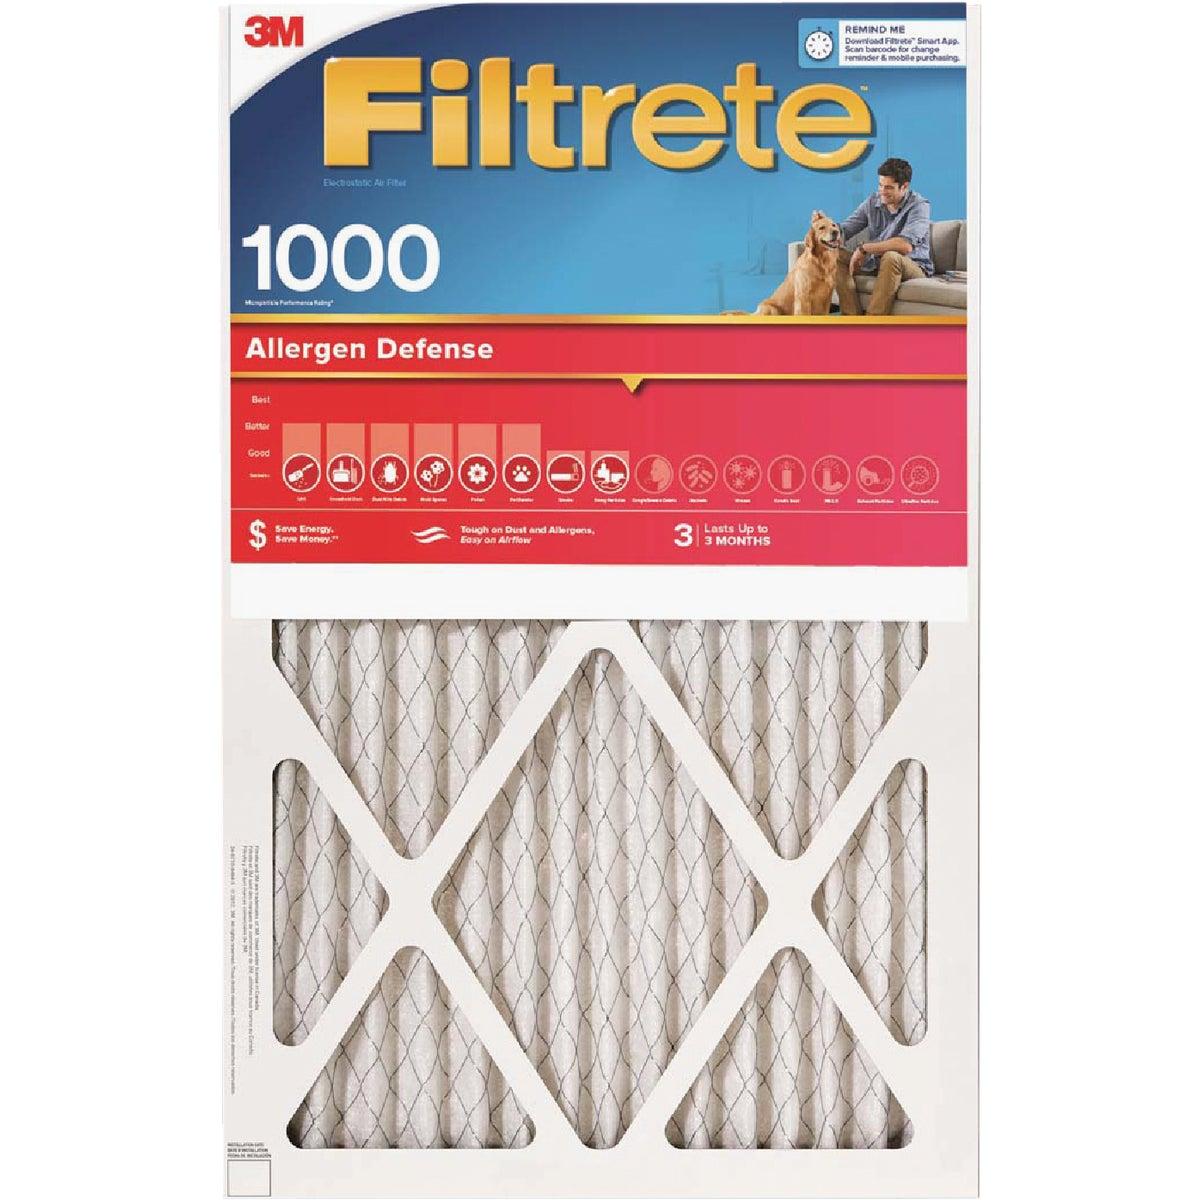 3M Filtrete 16 In. x 24 In. x 1 In. Allergen Defense 1000/1085 MPR Furnace Filter